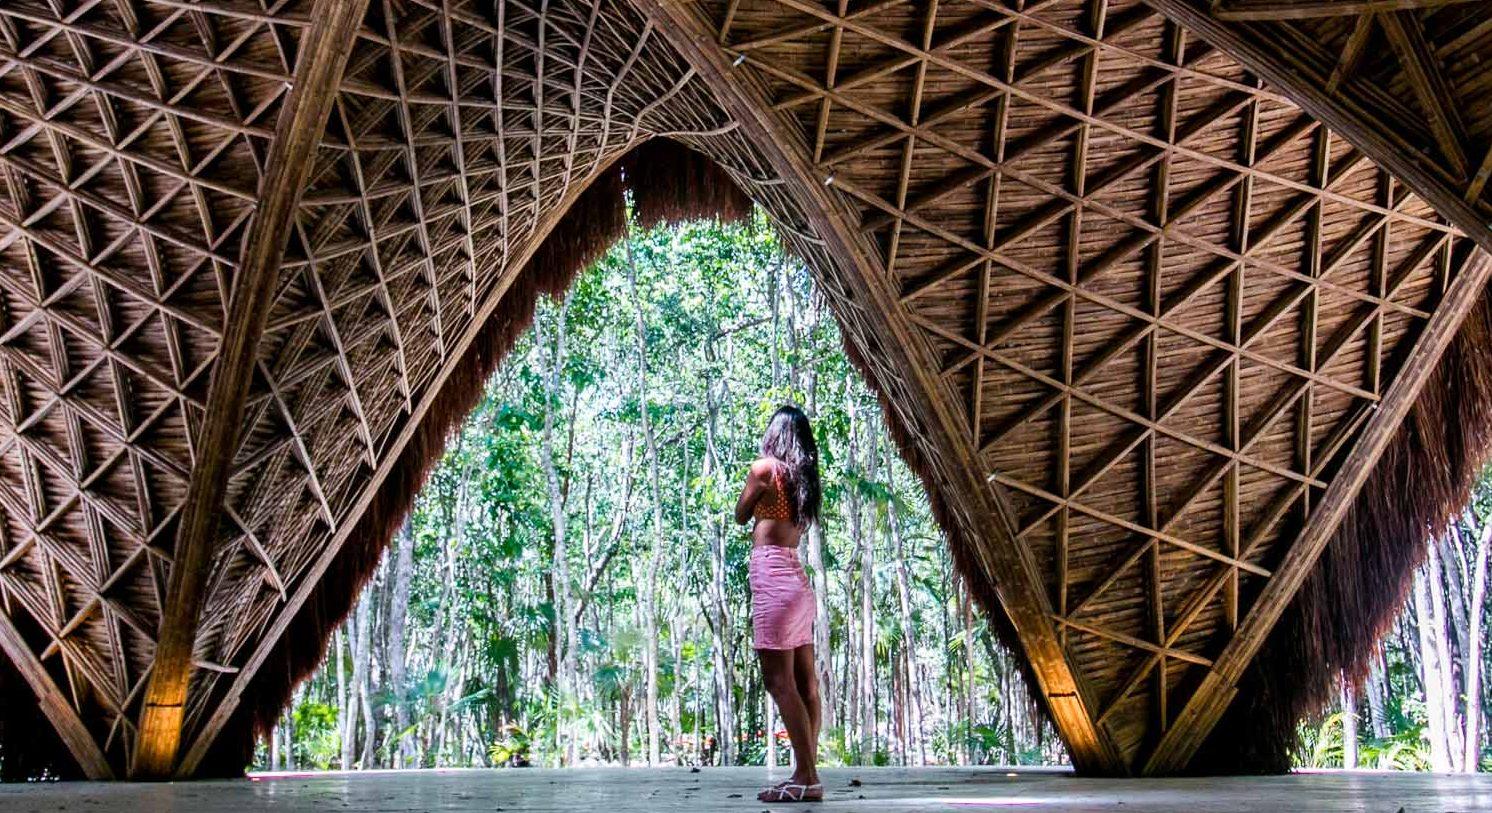 Tulum amenities: The magnificent yoga palapa inside Luum Zama gated community in Tulum